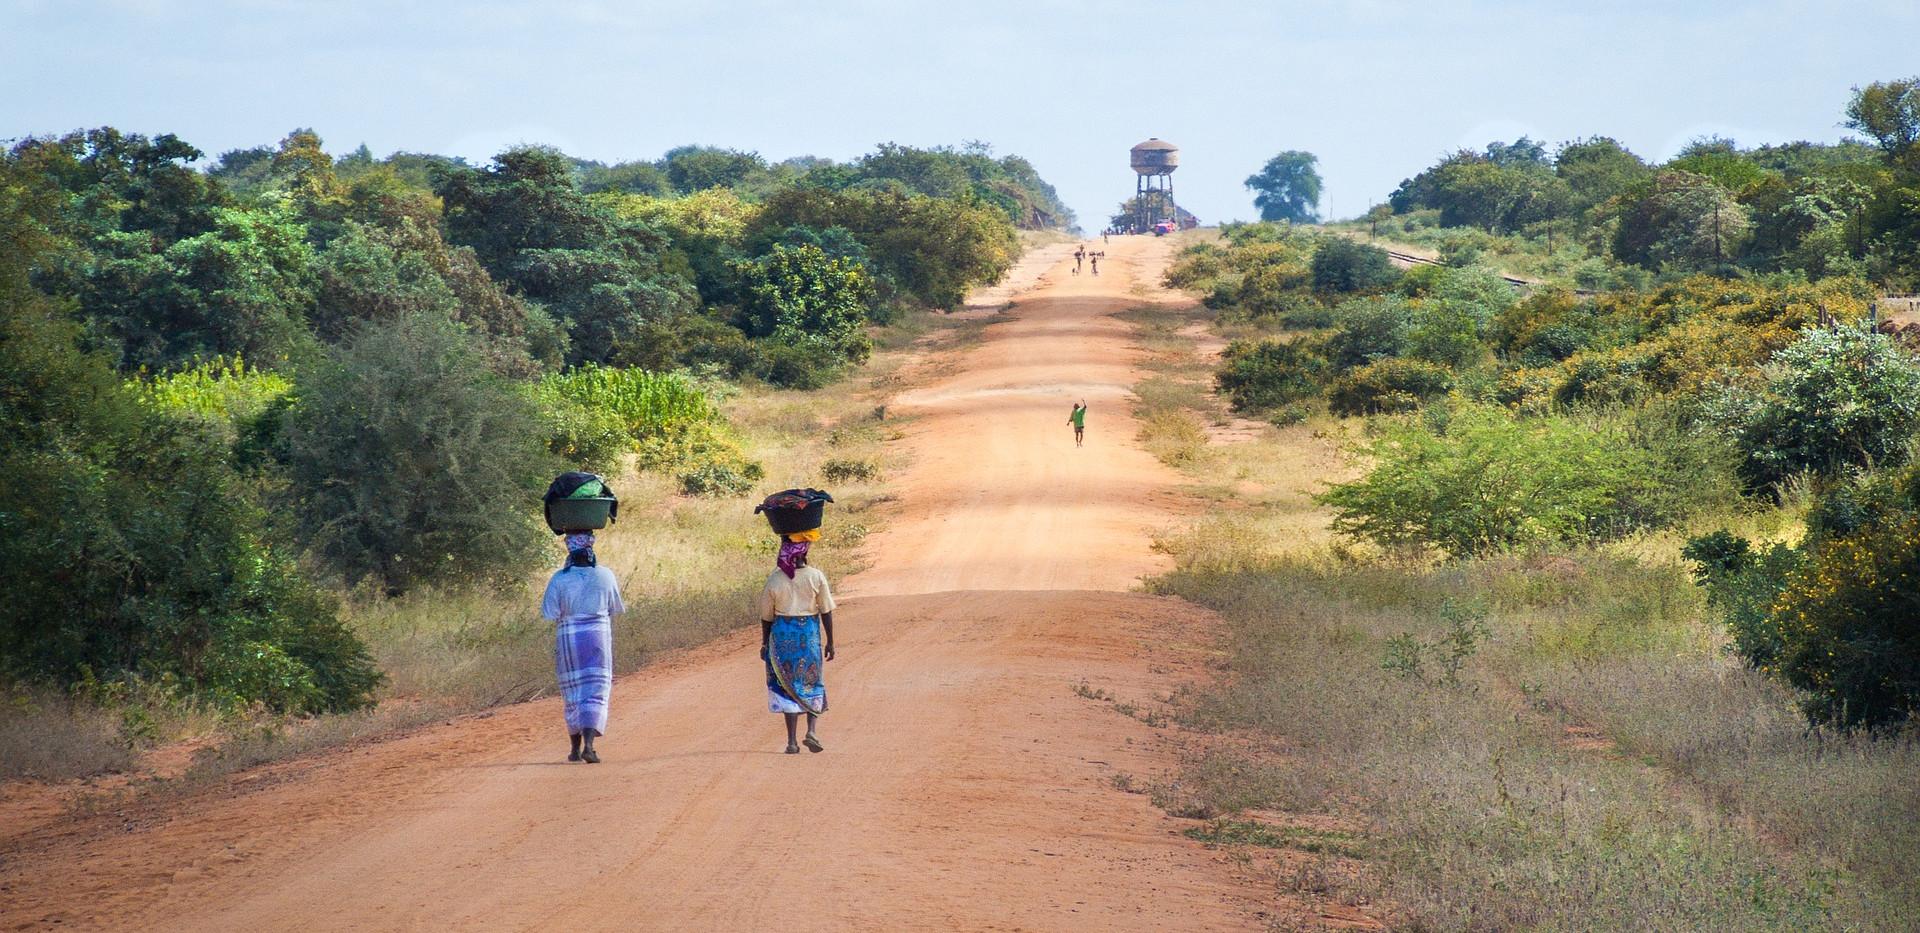 Mozambique _2_african-women-walking-alone